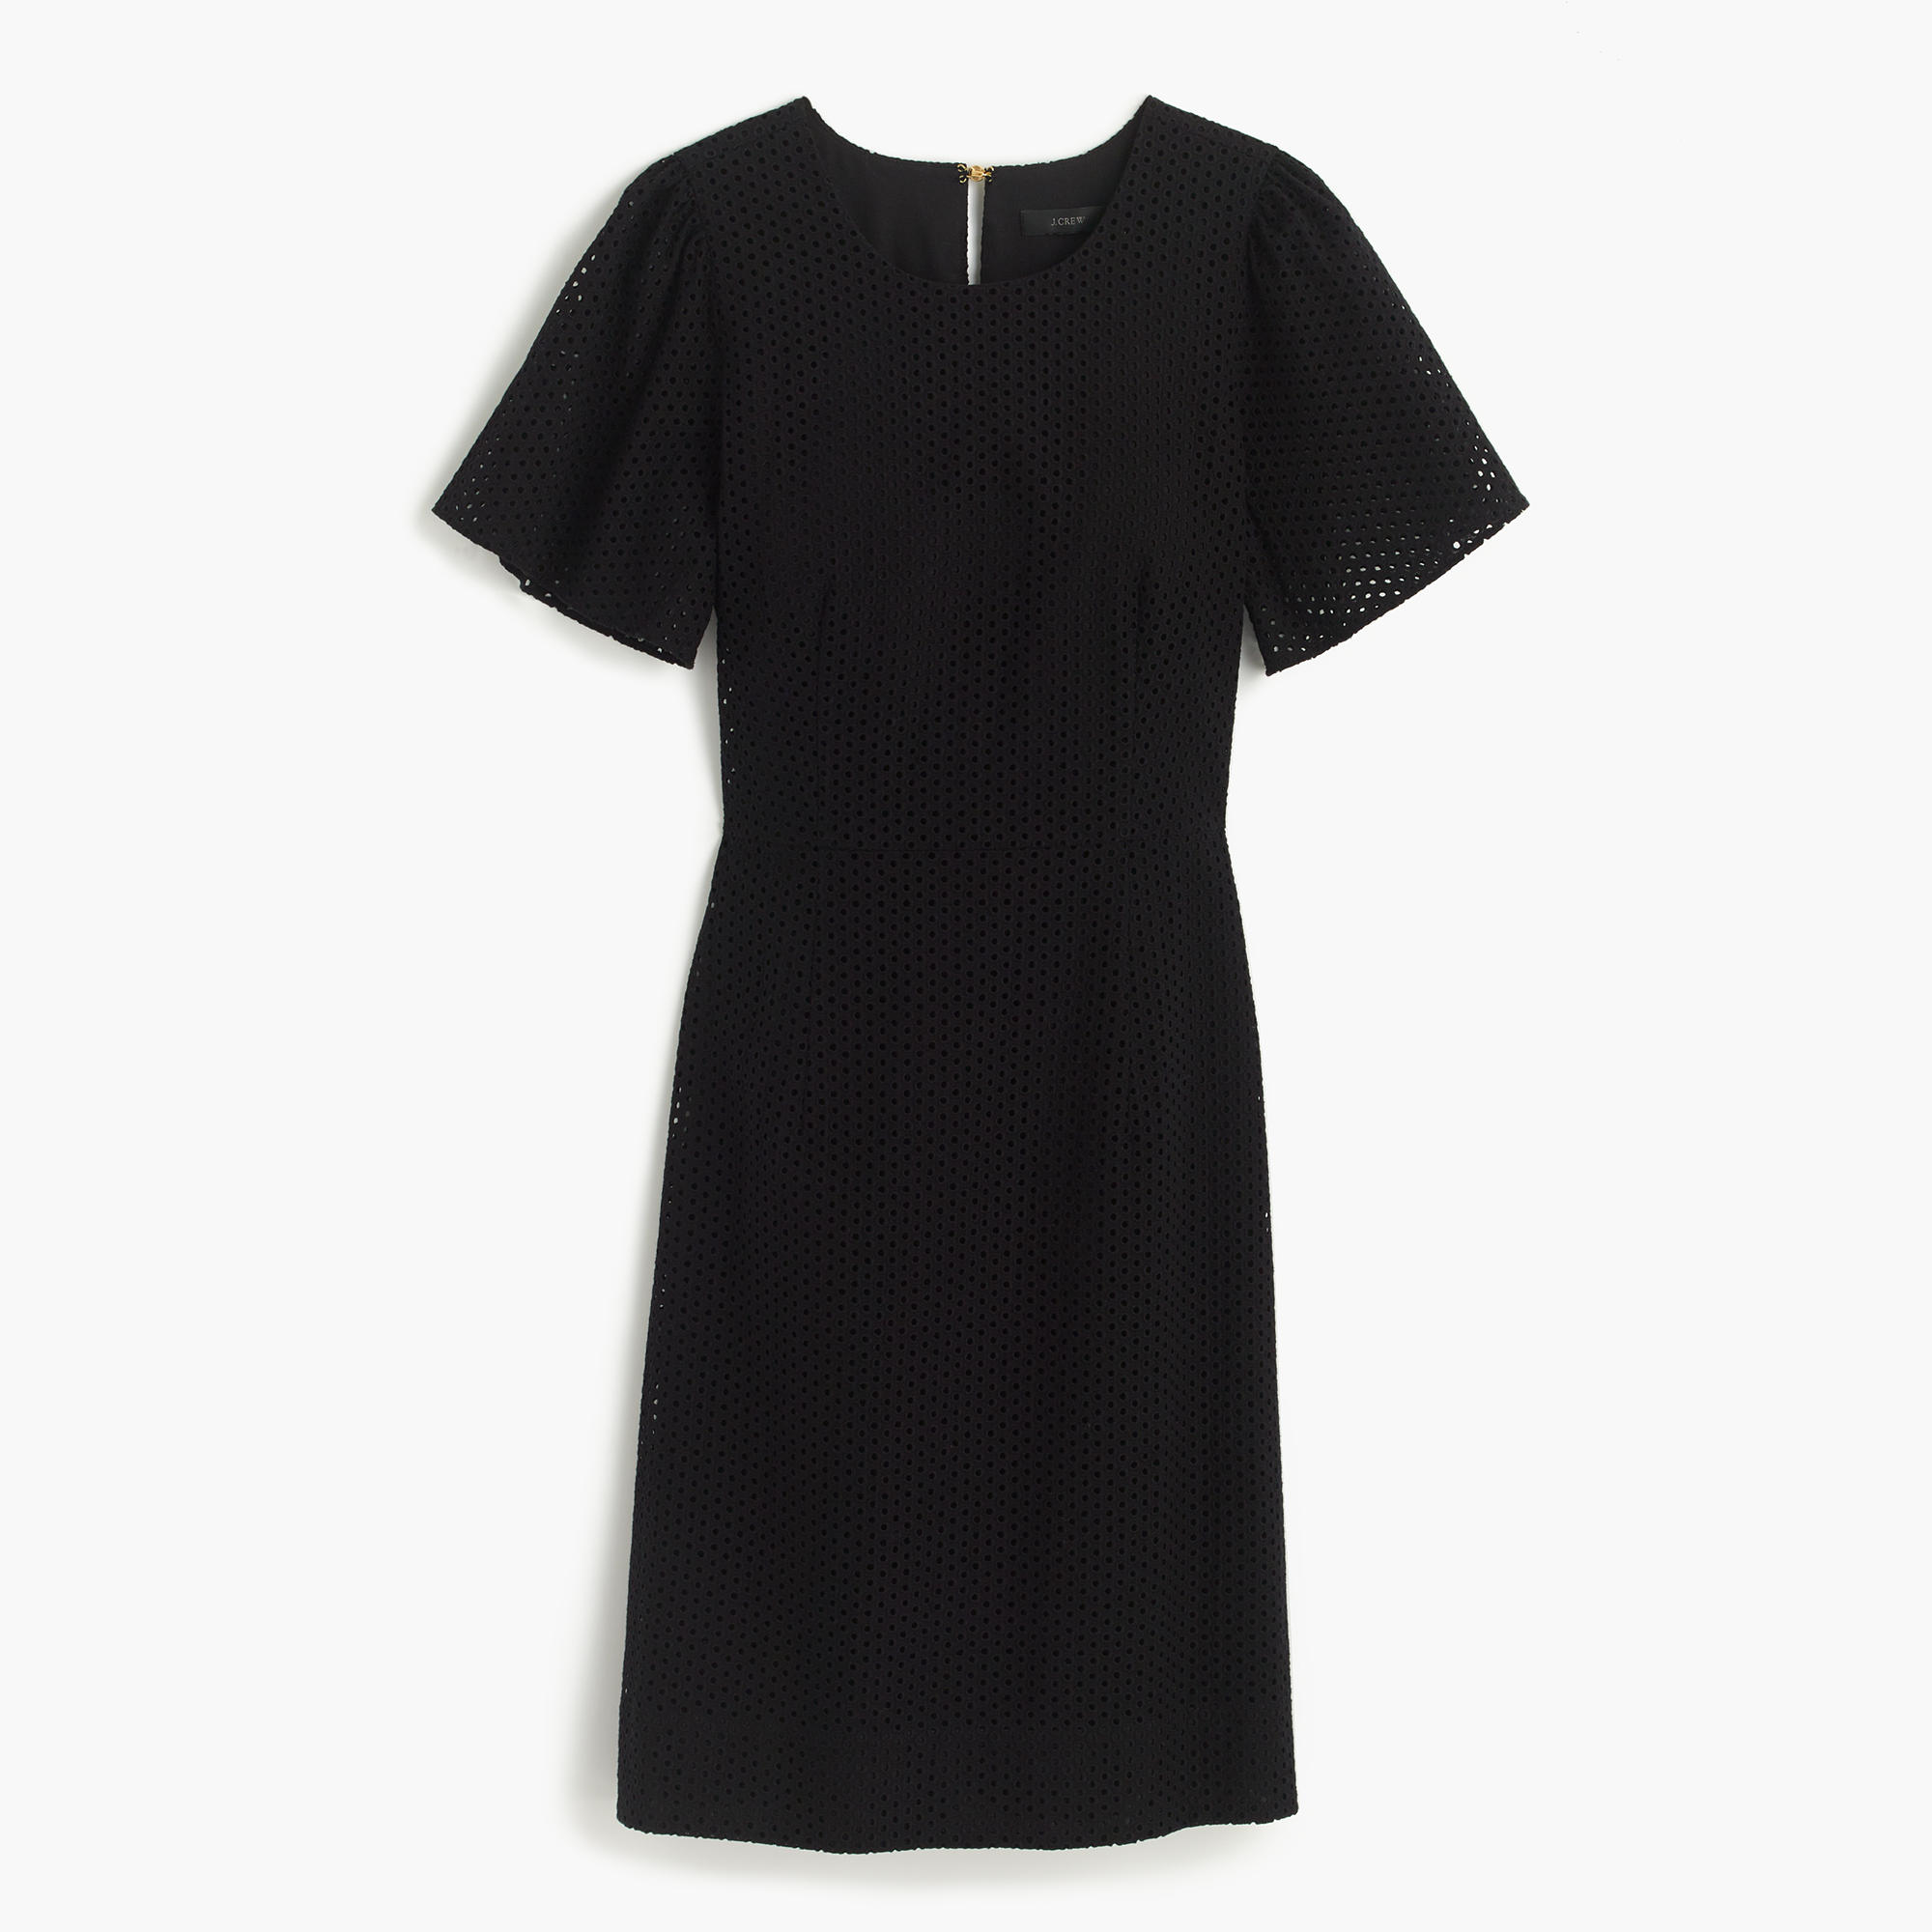 Black dress j crew - Black Dress J Crew 22